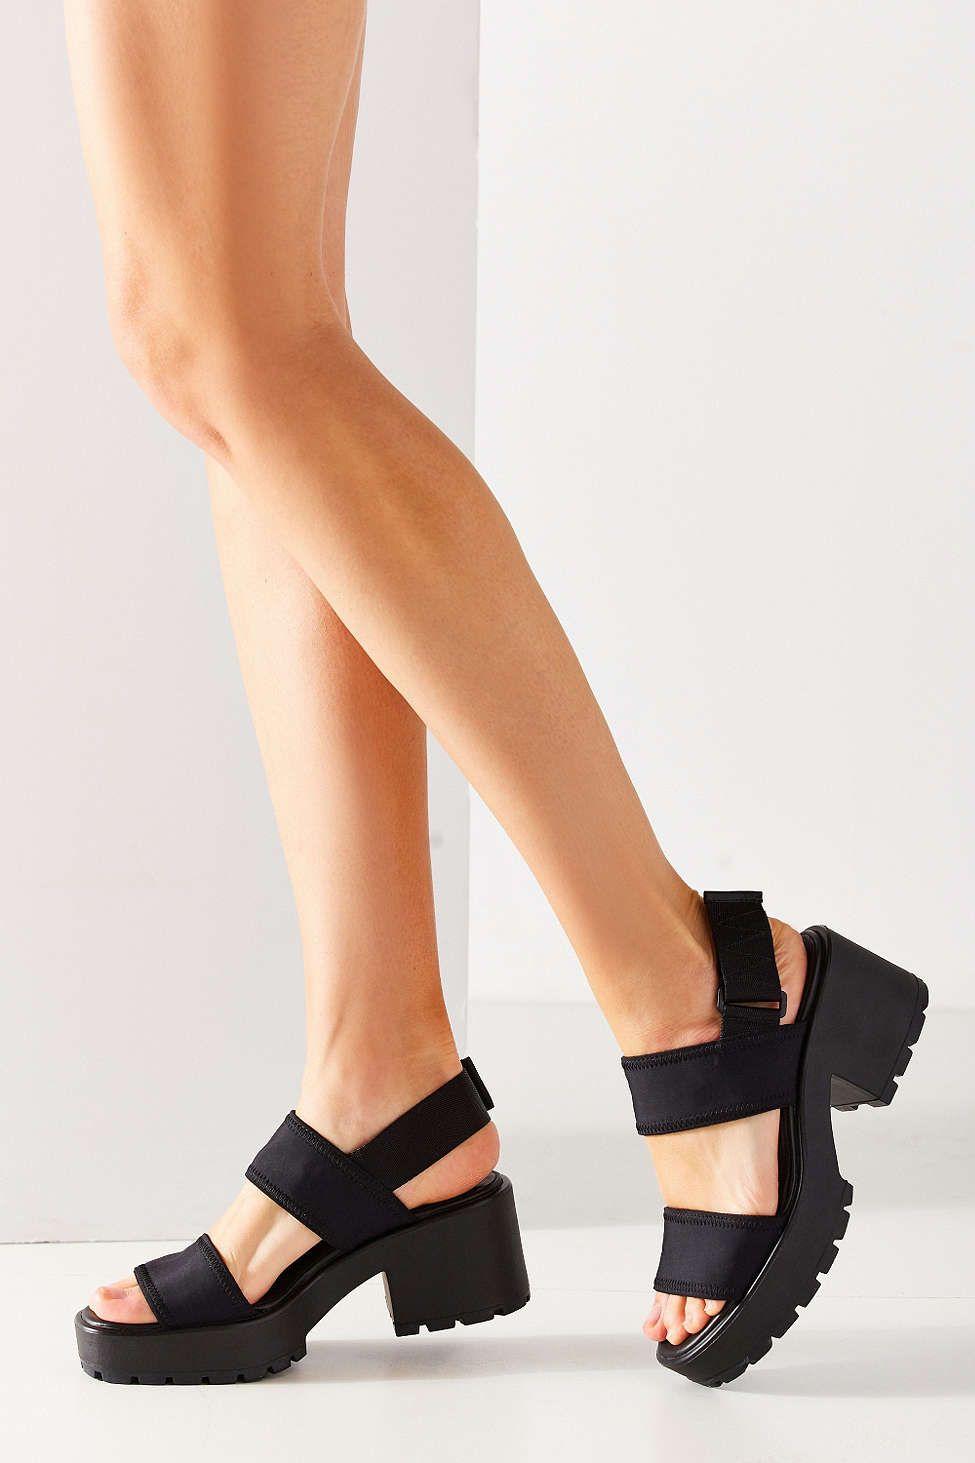 Sandales Dioon Vagabond | اشياء للشراء | Chaussure, Sandales